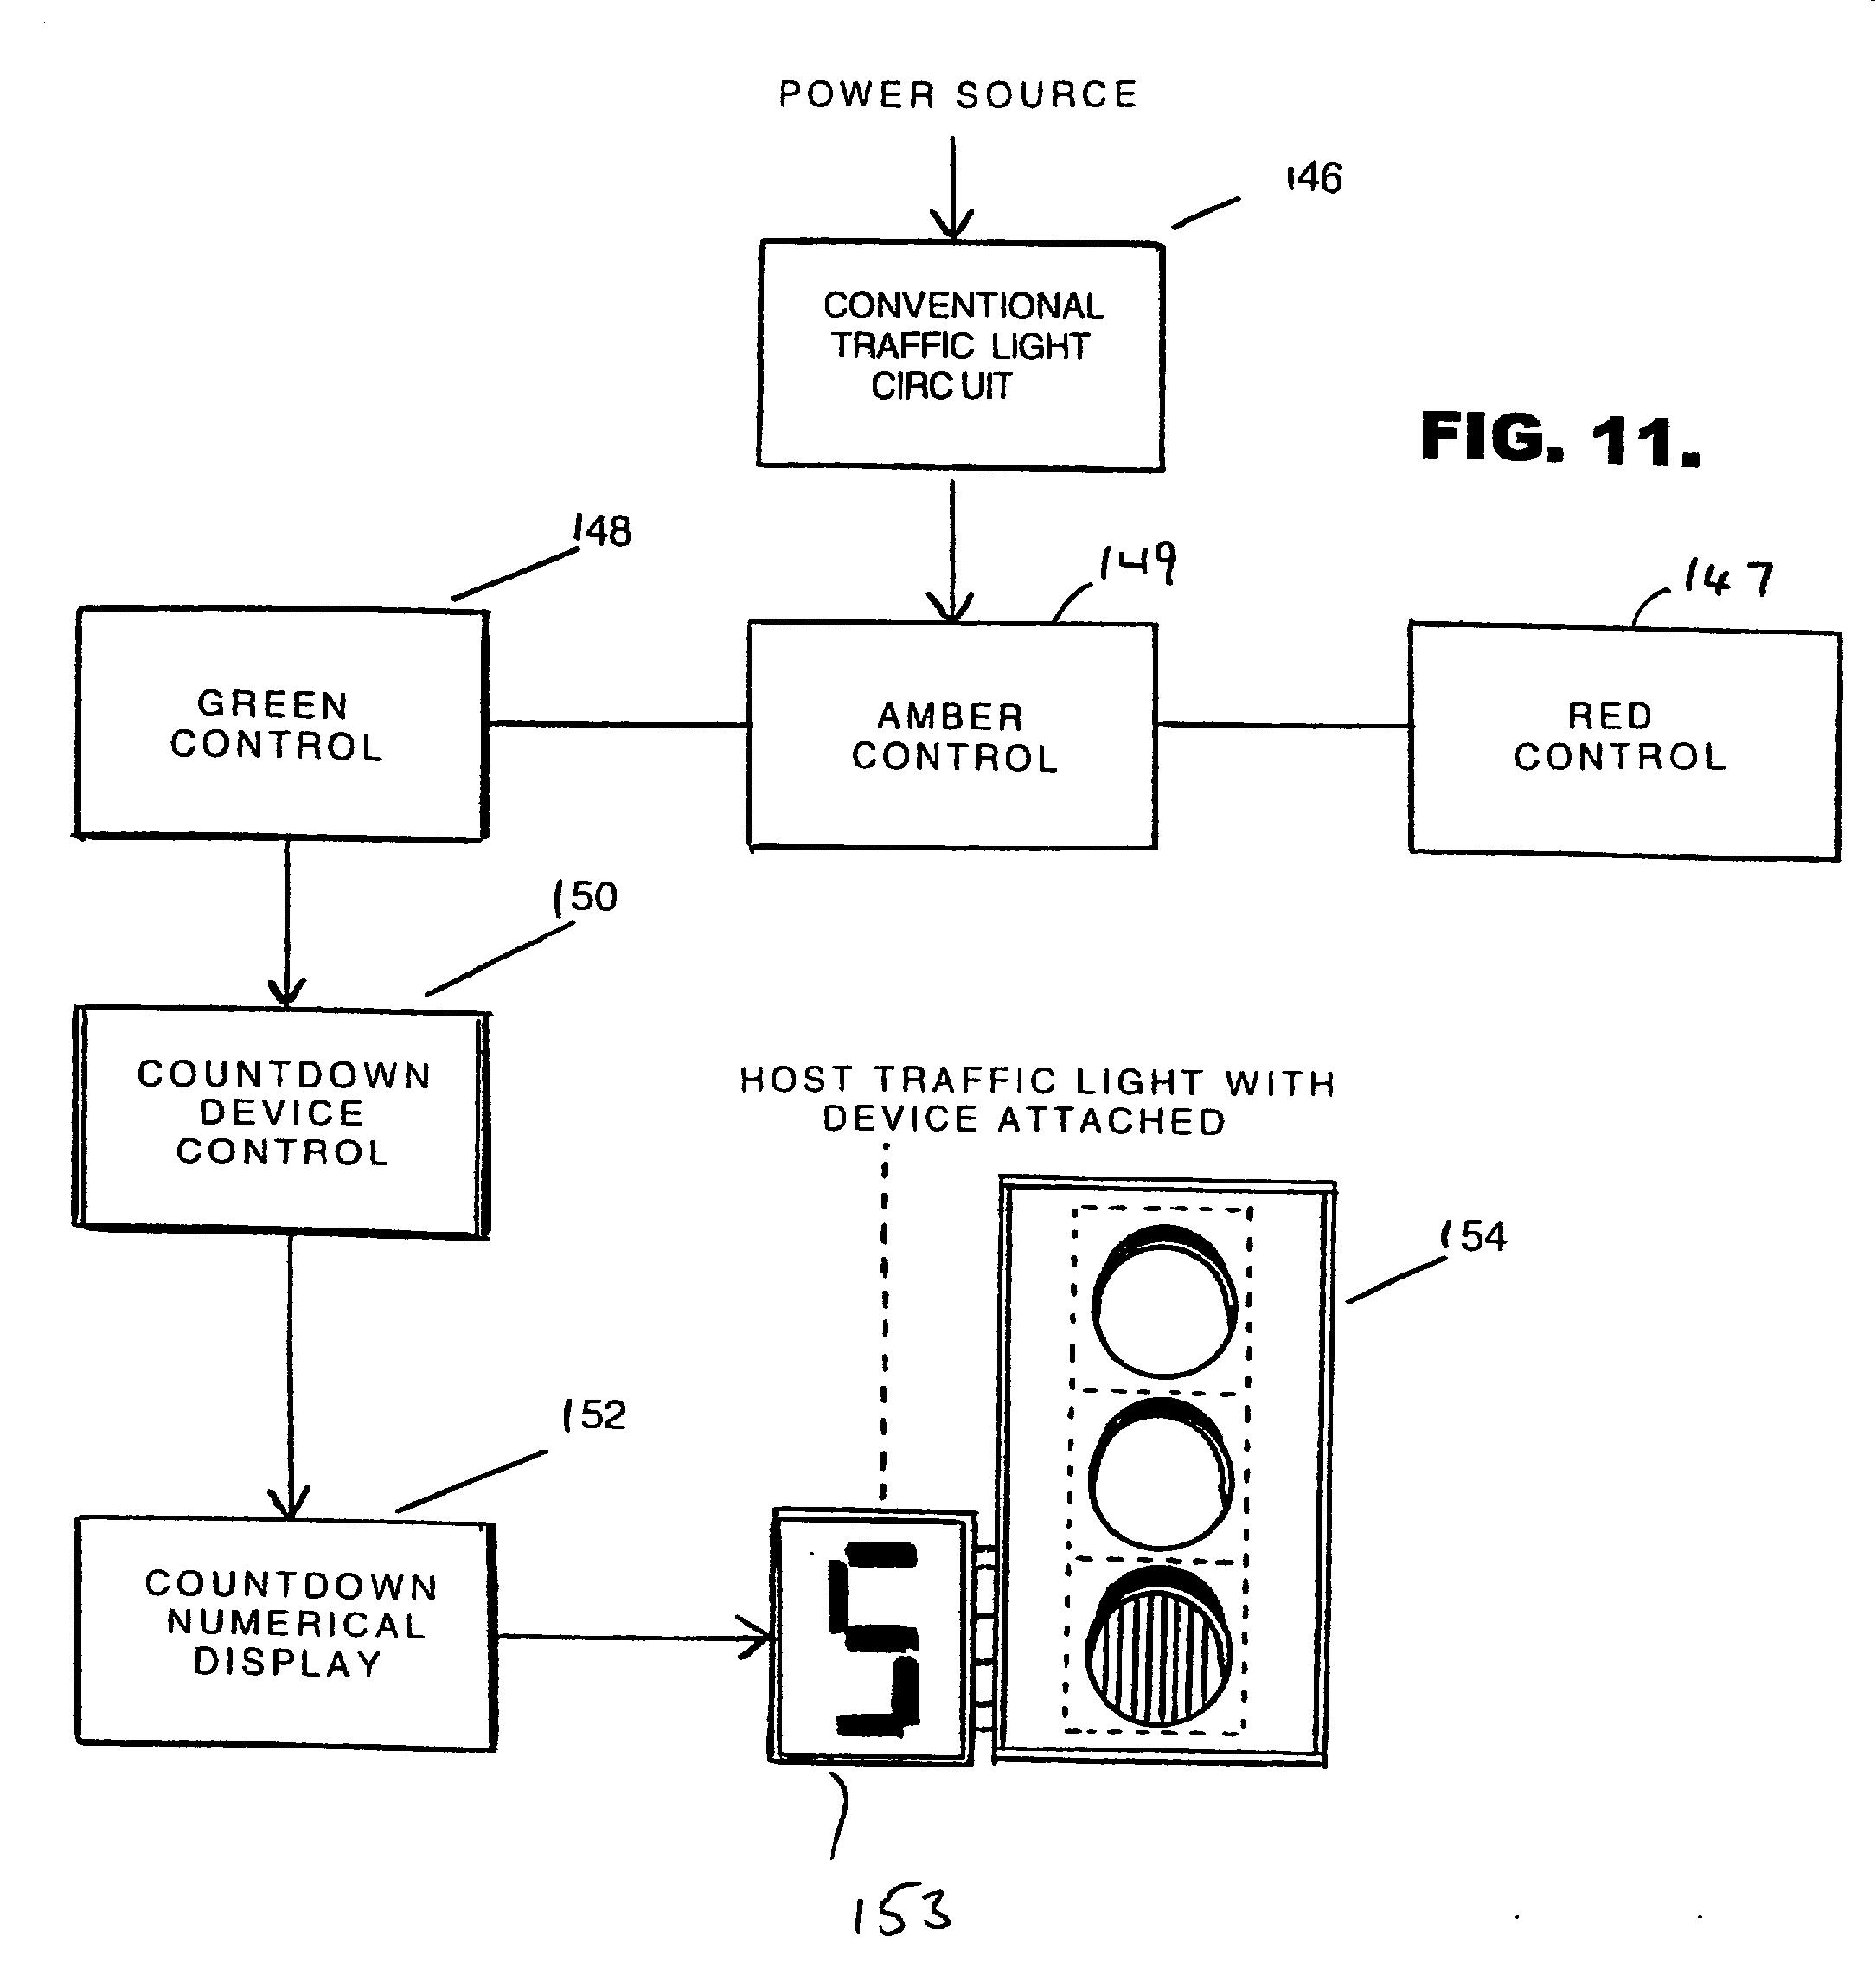 Priority Traffic Light Control Schematic Trusted Wiring Diagram Ladder Logic Controller Using Arduino Report Design Of Intelligent Circuit